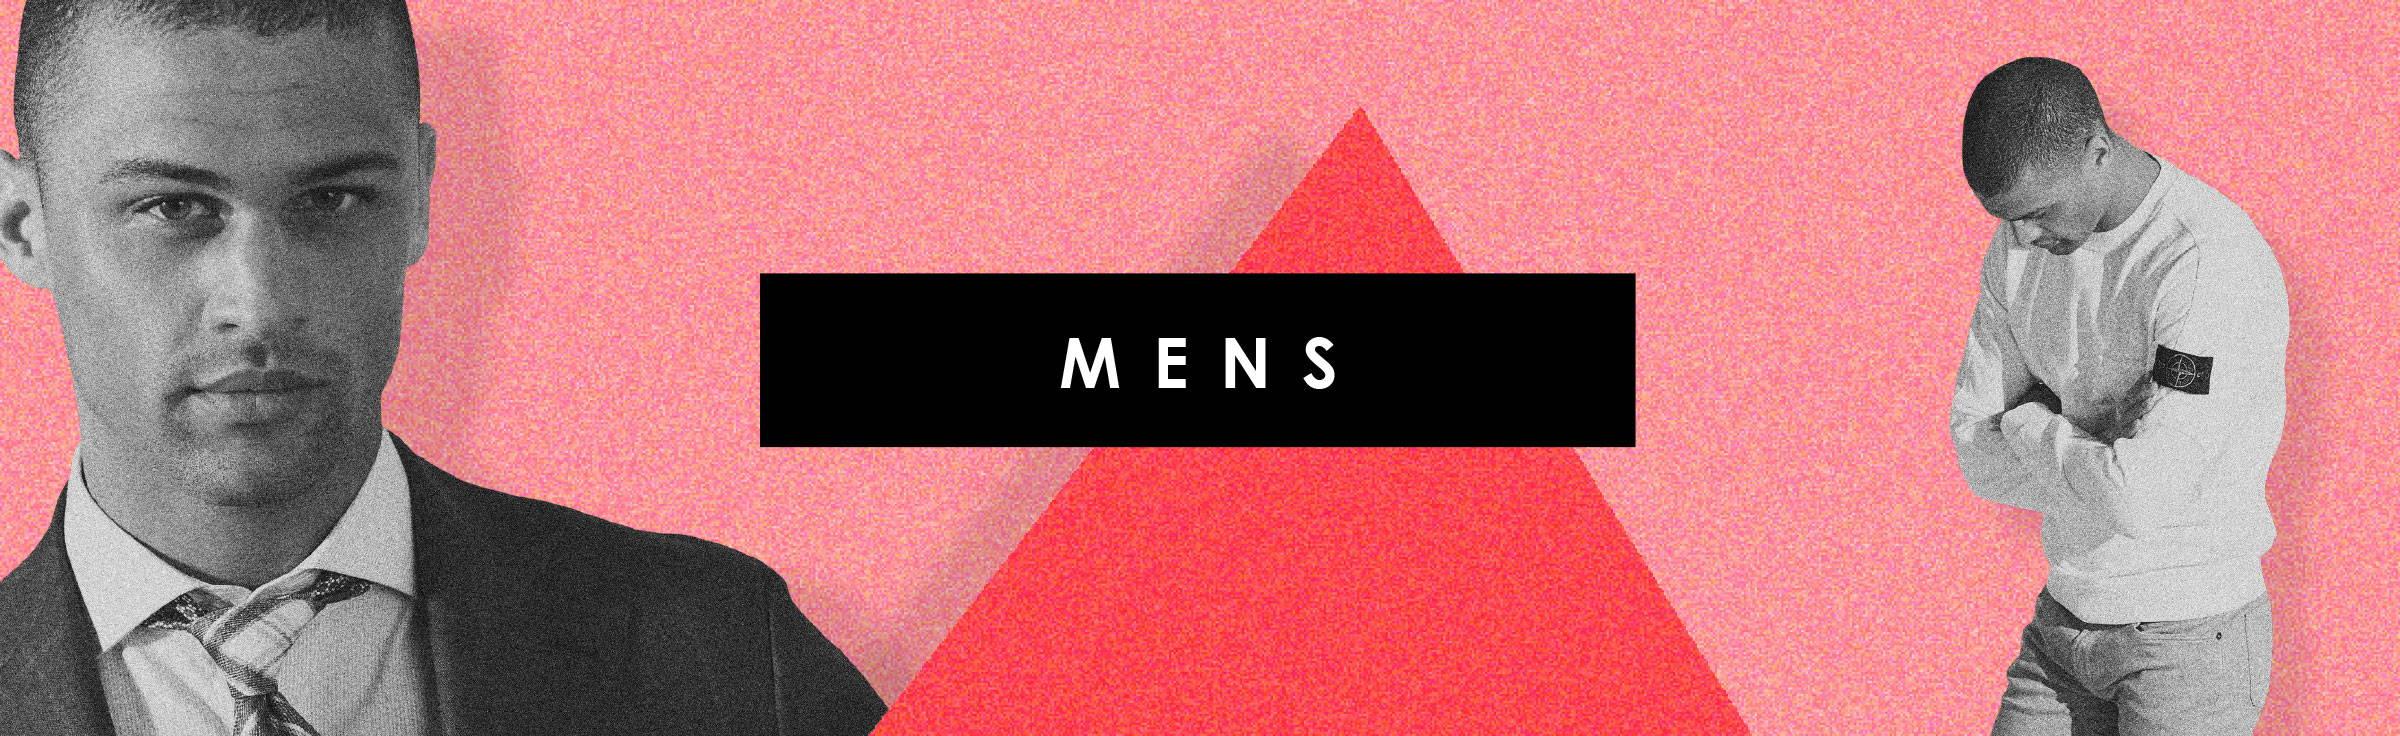 Men's spring summer sale clothes